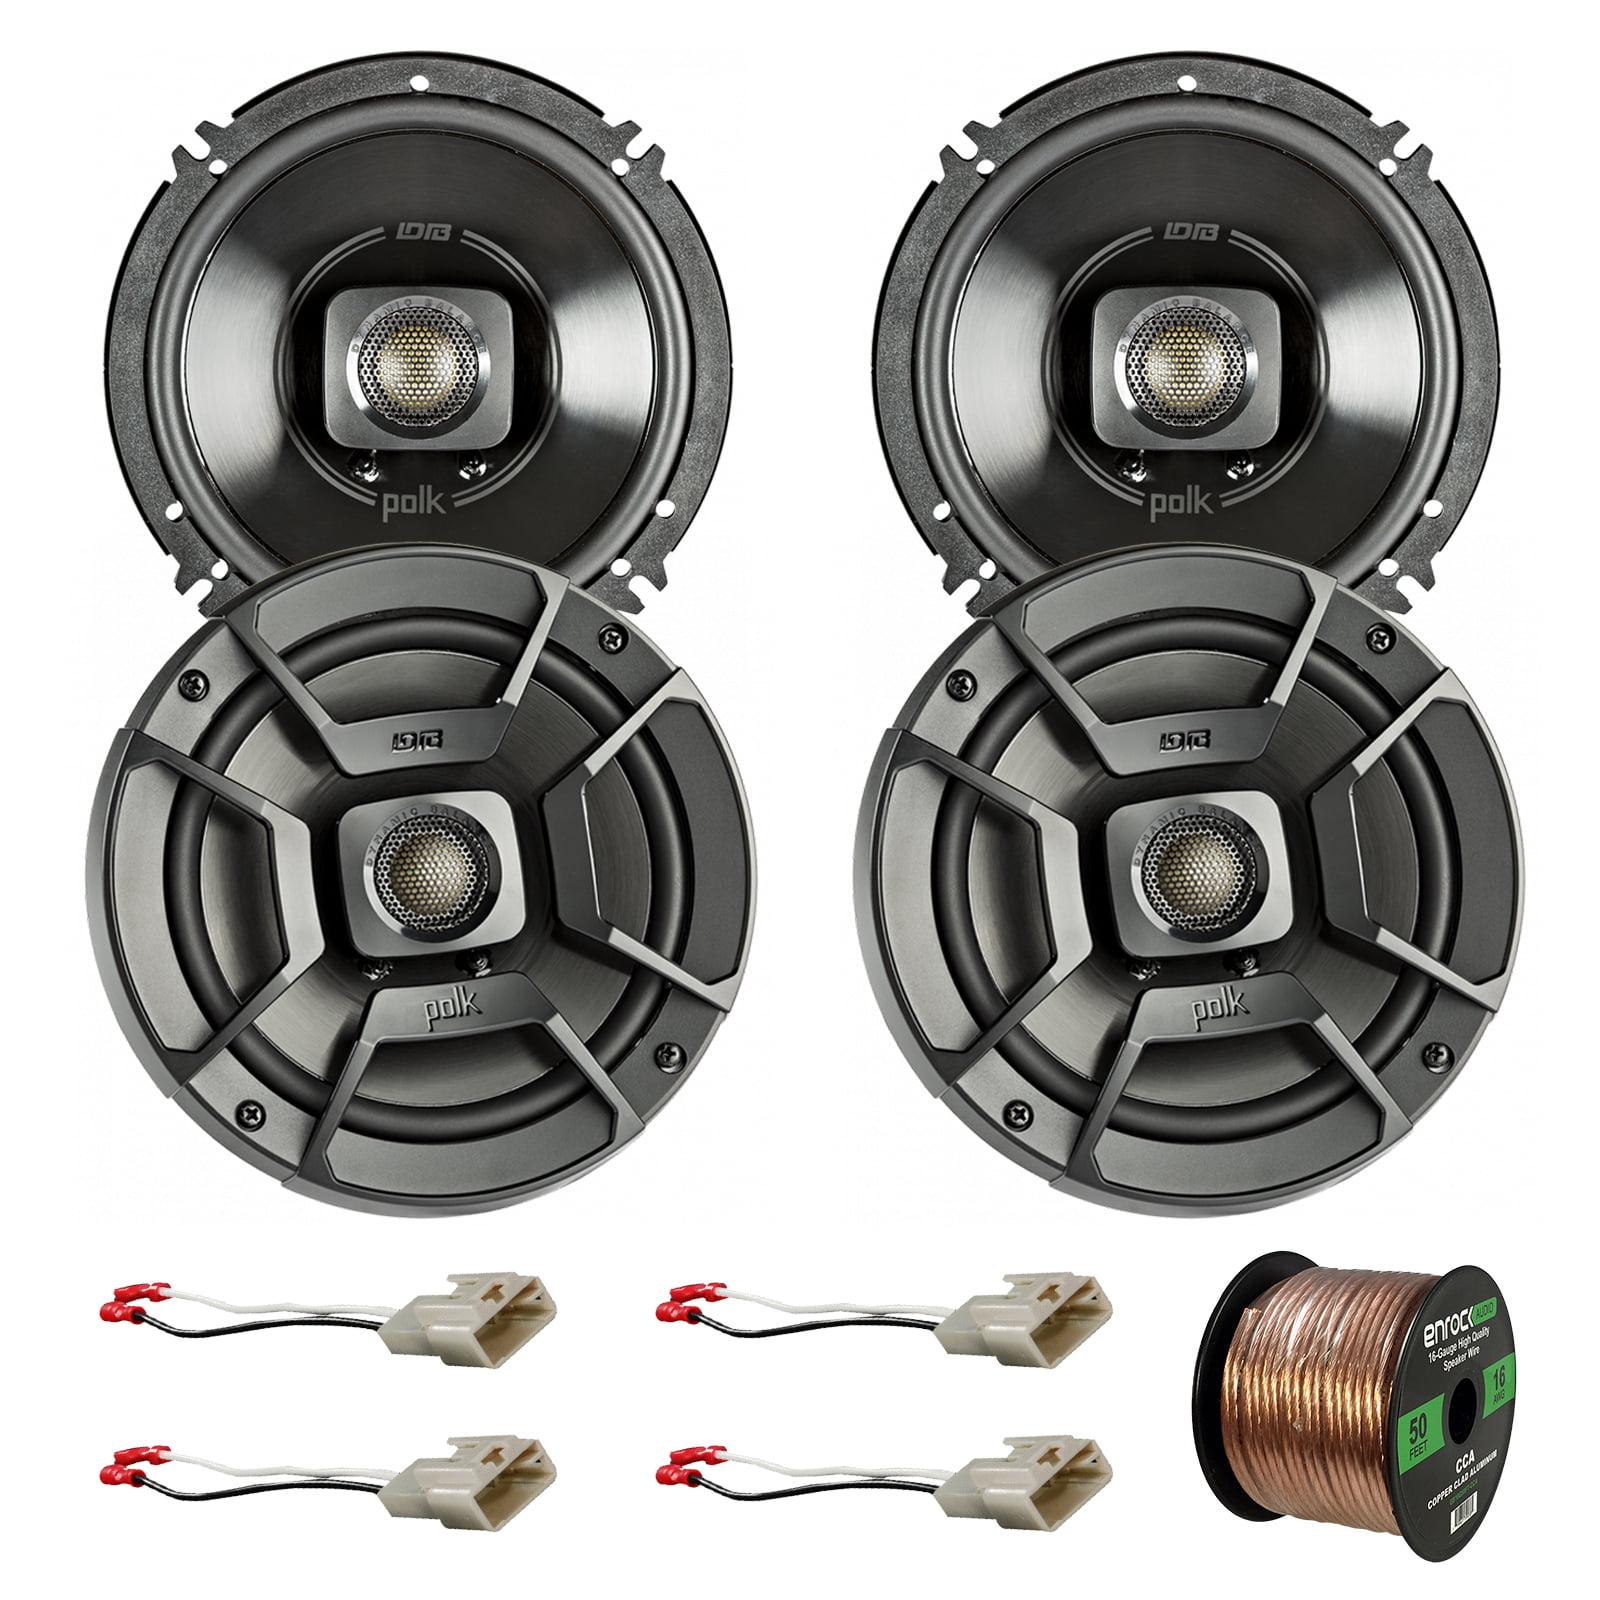 "4x Polk Audio 6.5"" 300W 2 Way Car/Marine ATV Stereo Coaxial Speakers DB652, 4x Metra 72-8104 Speaker Connector for Select Toyota Vehicles, Enrock Audio 16-Gauge 50 Foot Speaker Wire"